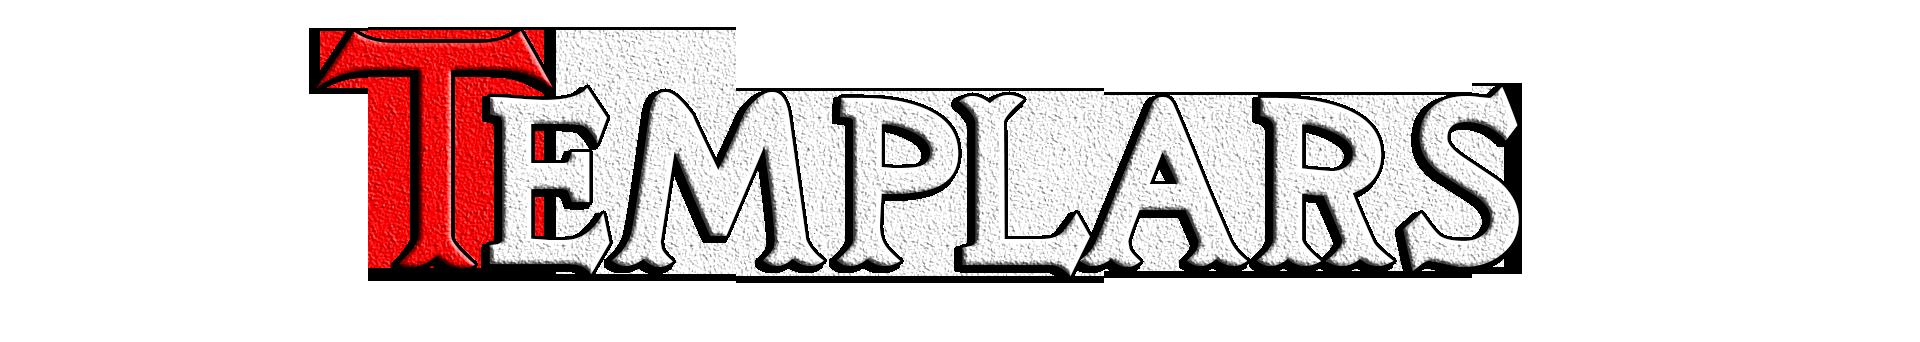 Templars1.png